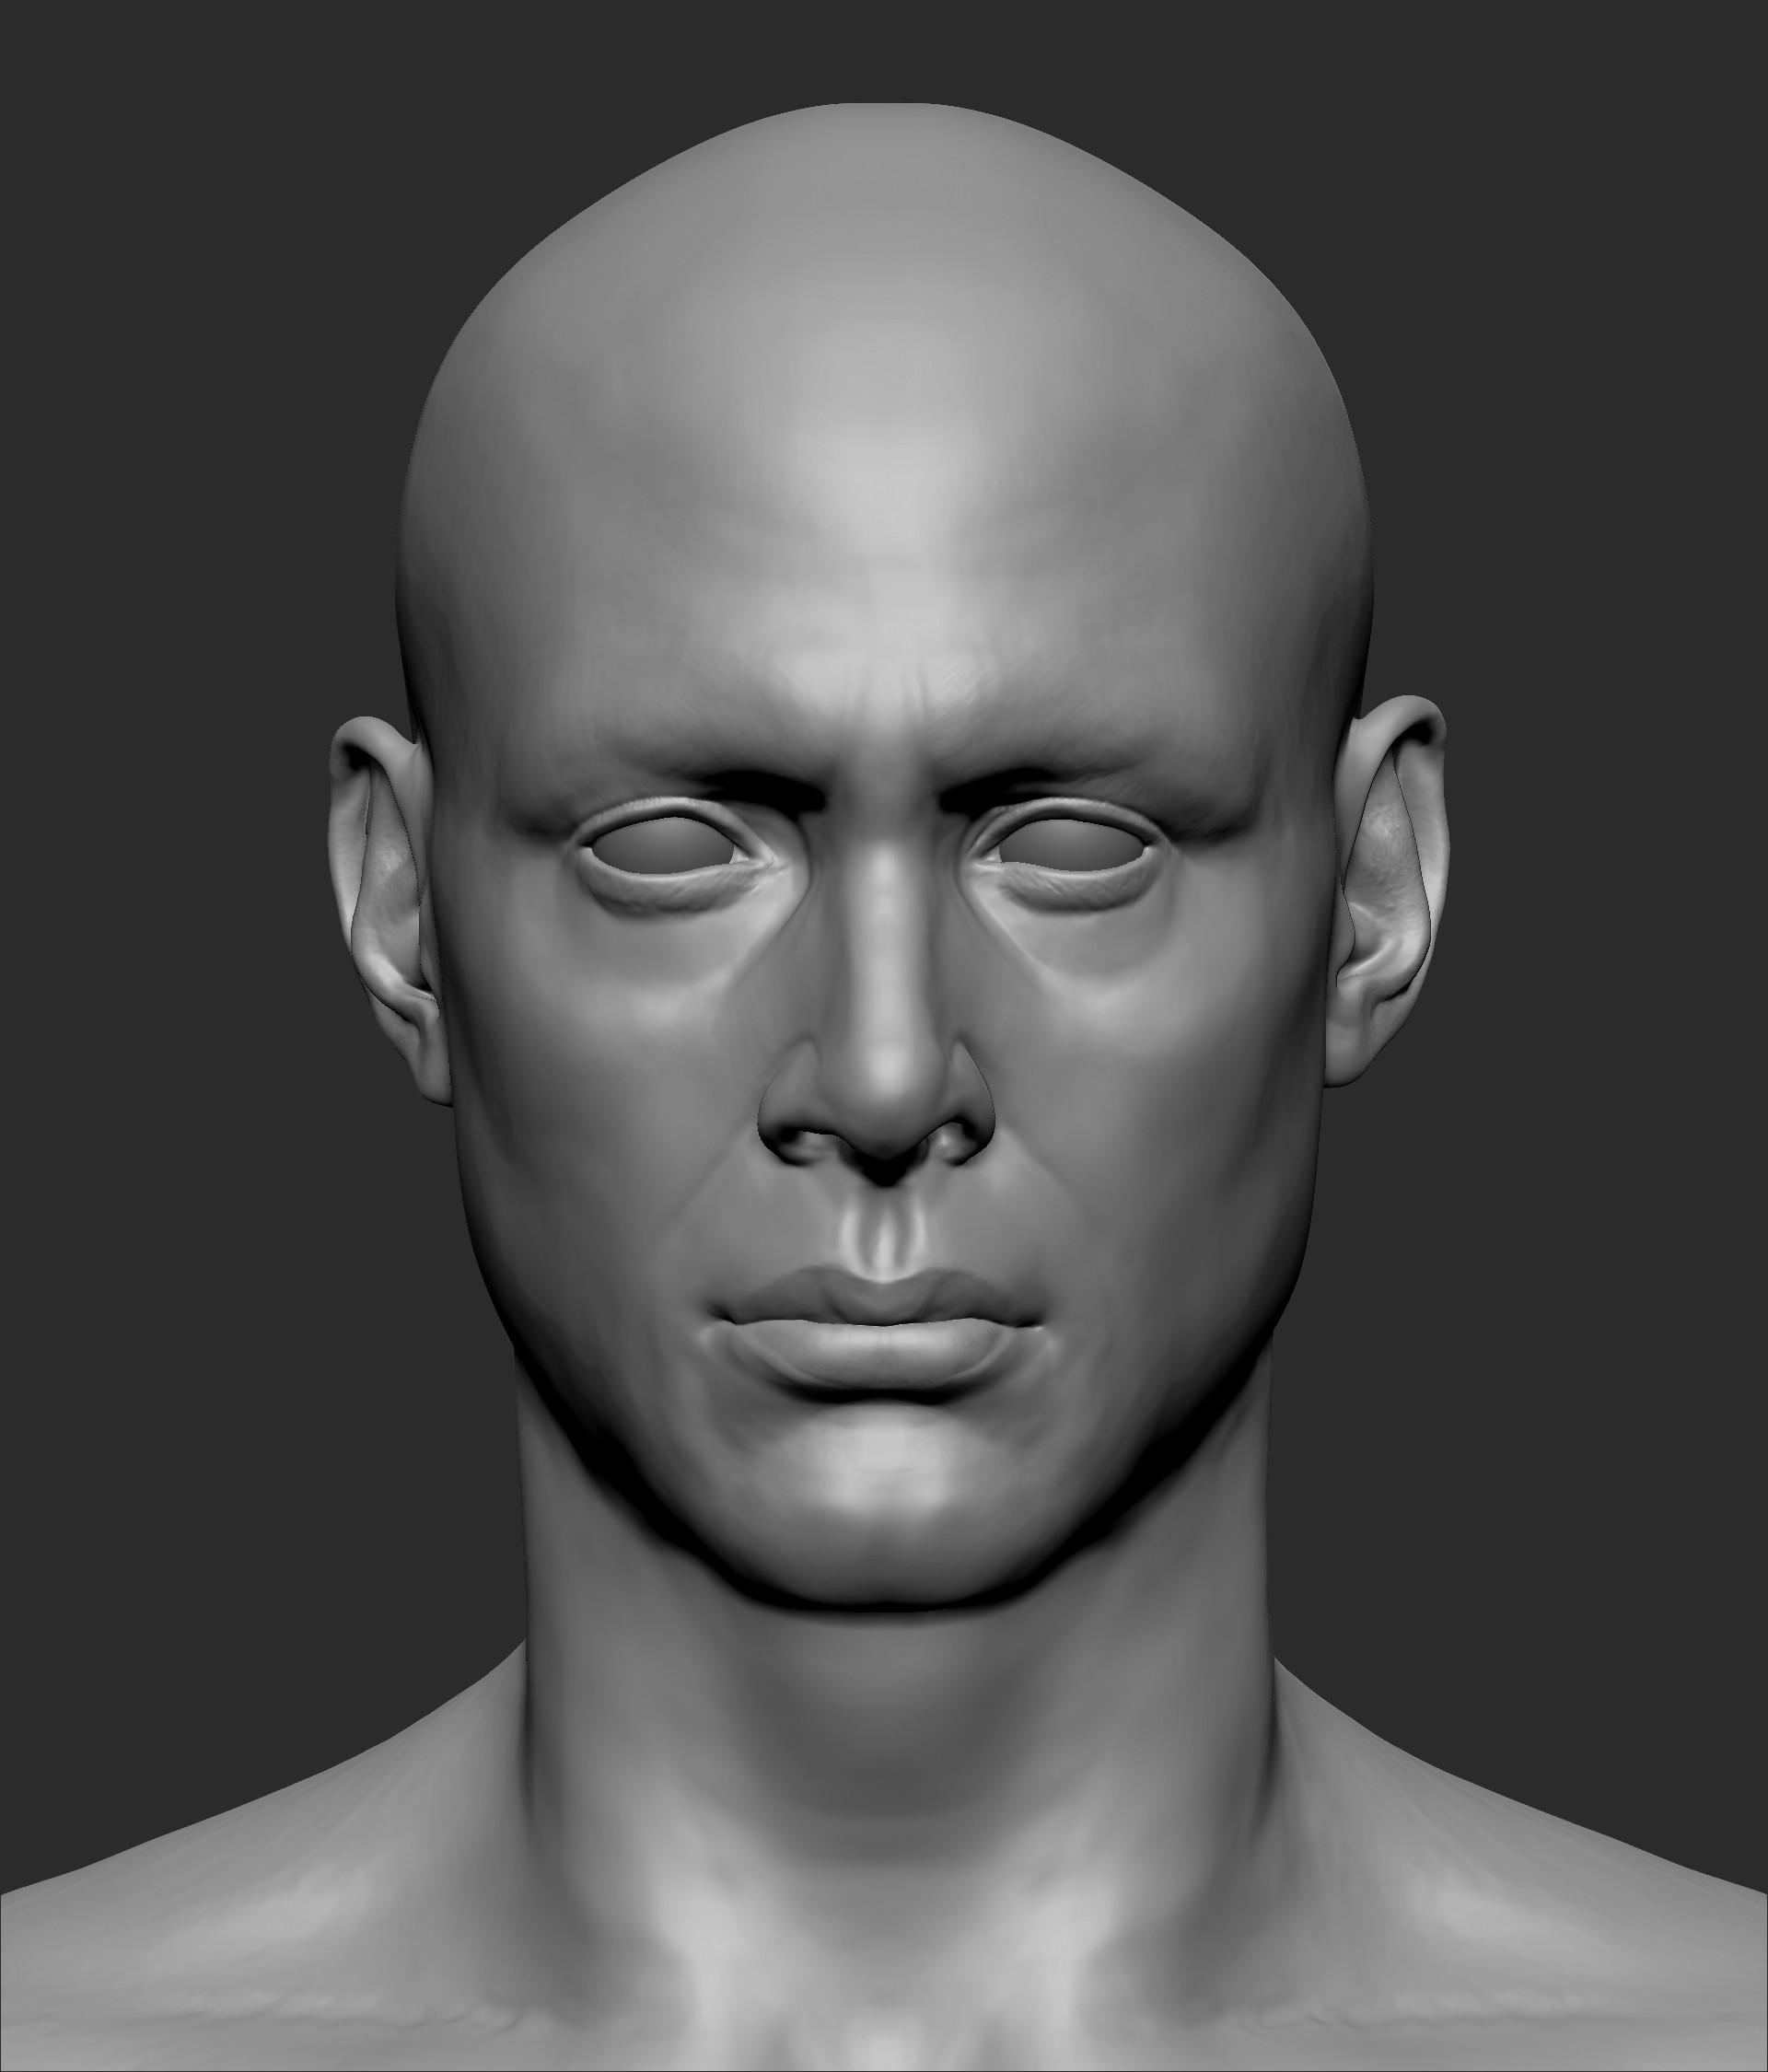 Juan Diego Lugo - Anatomy Face Practice